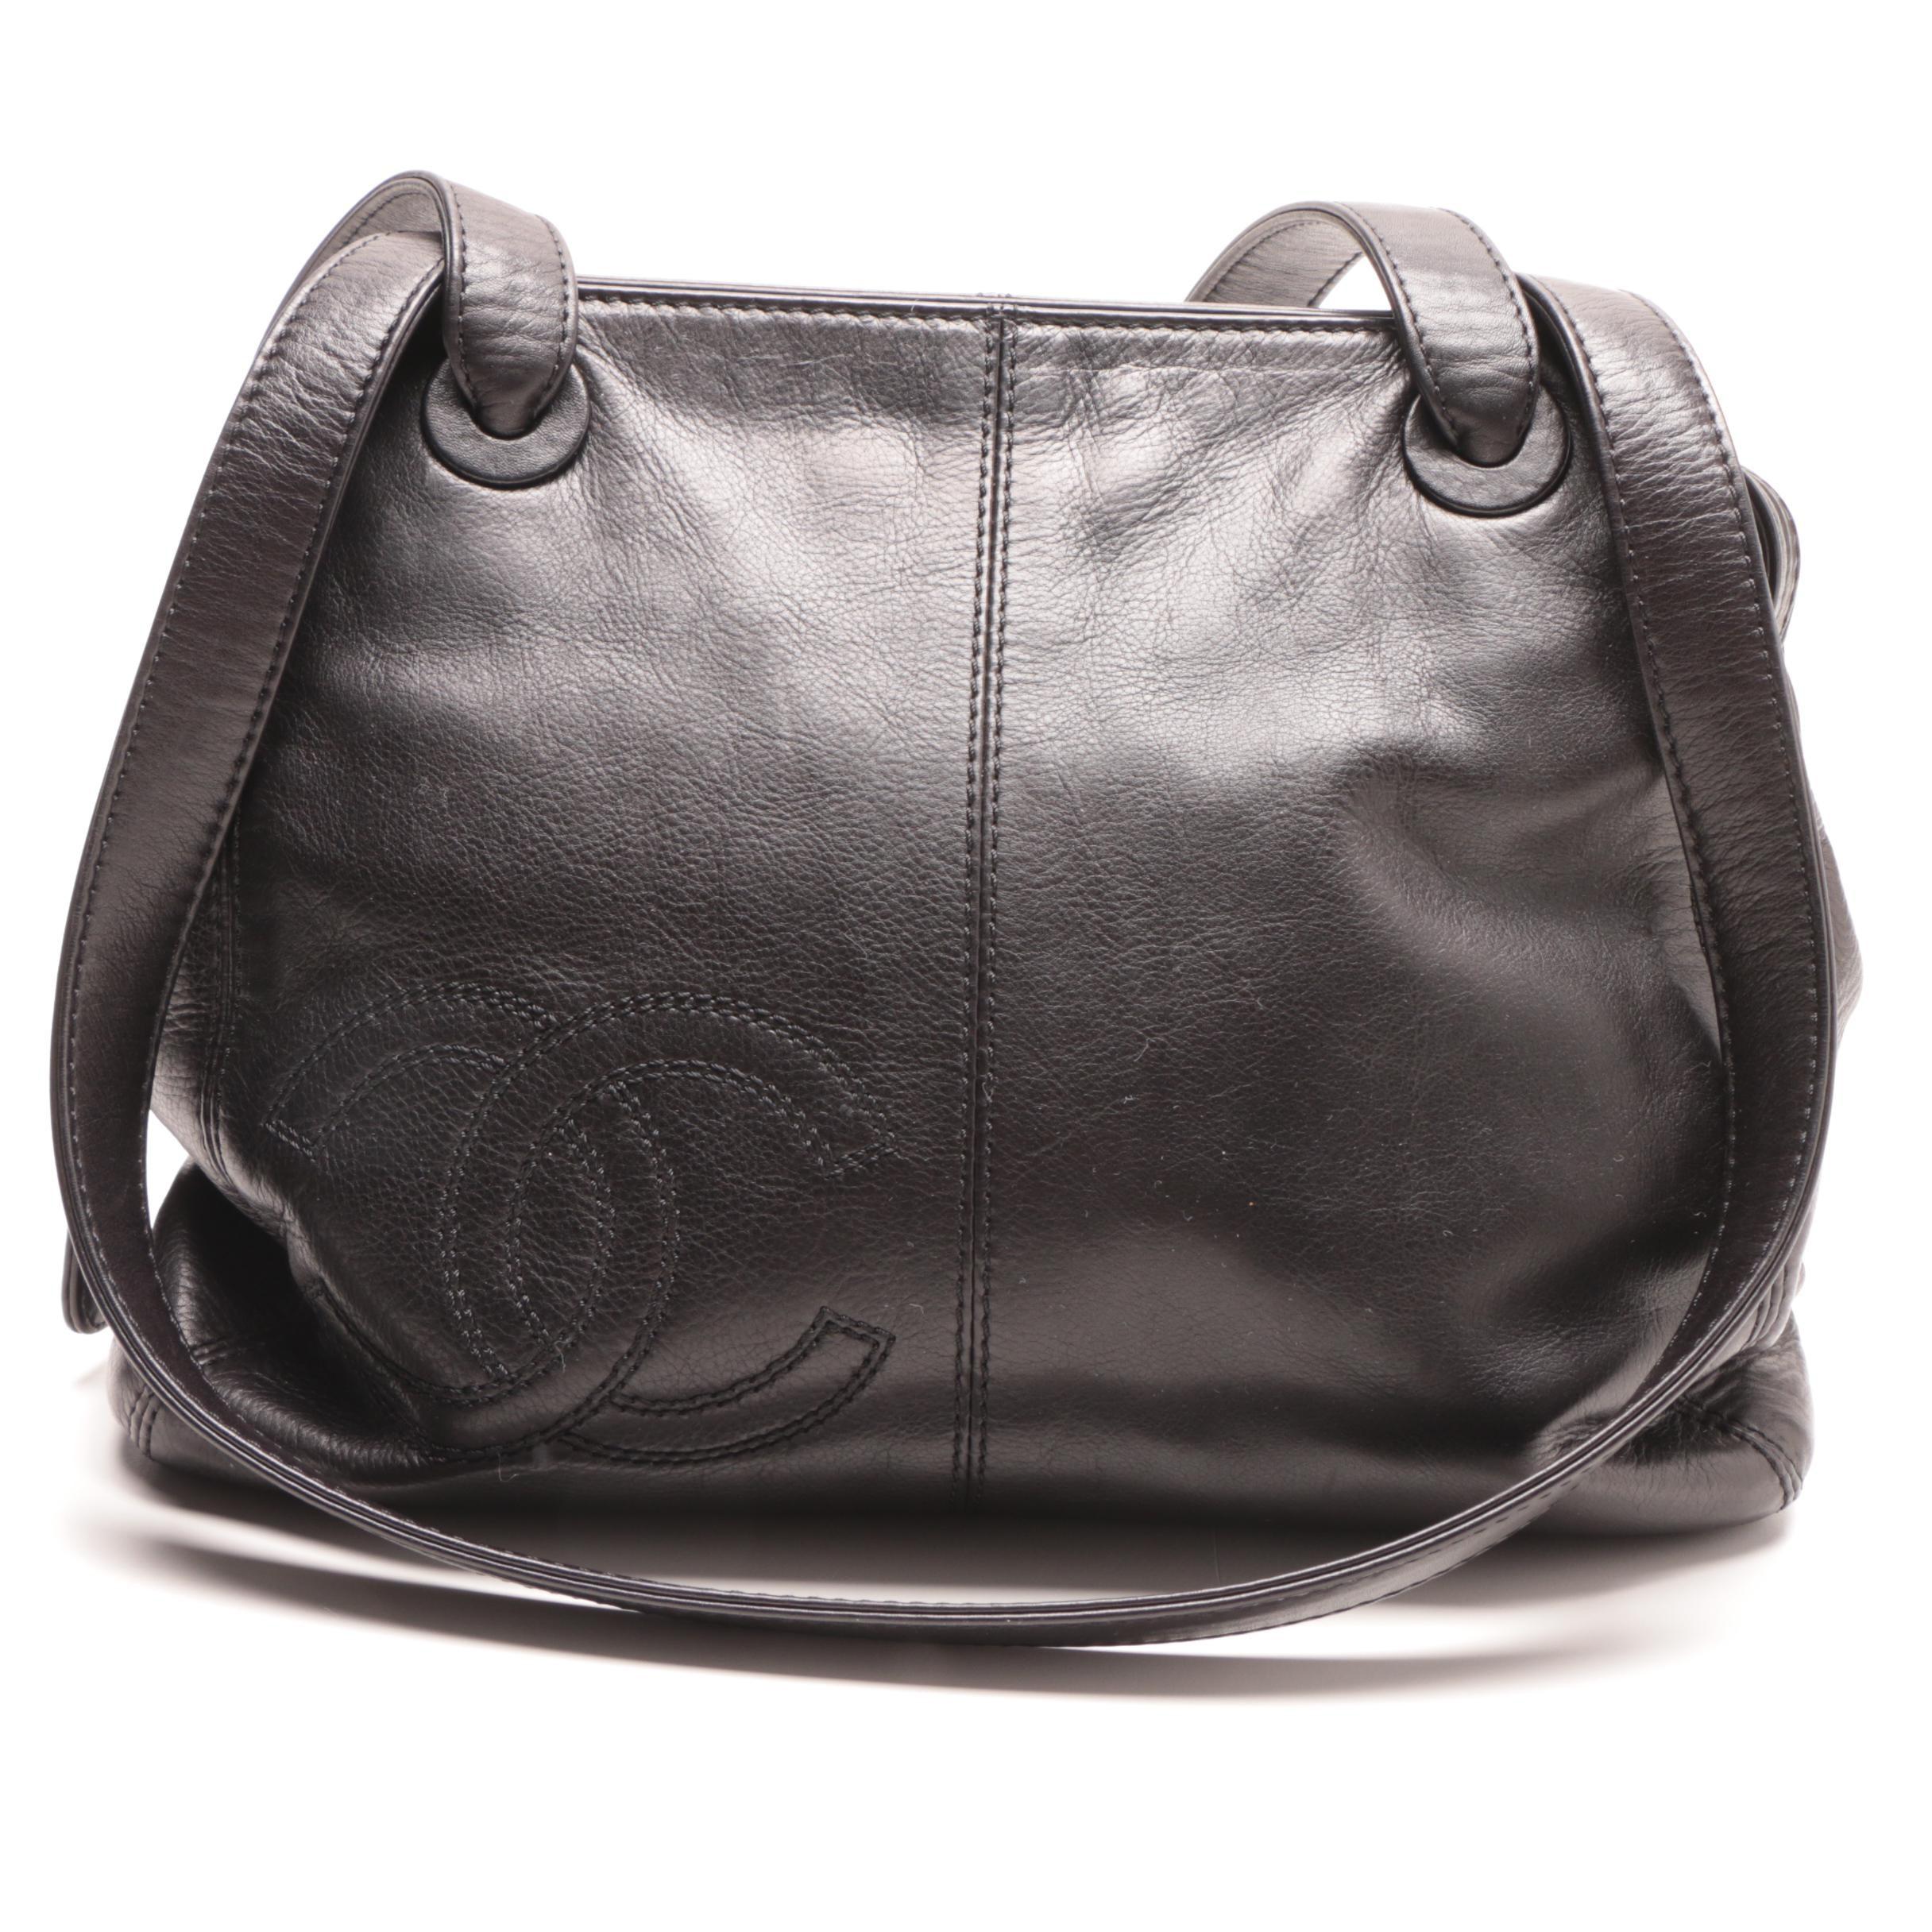 Late 1990s Chanel Black Lambskin Leather Shoulder Bag